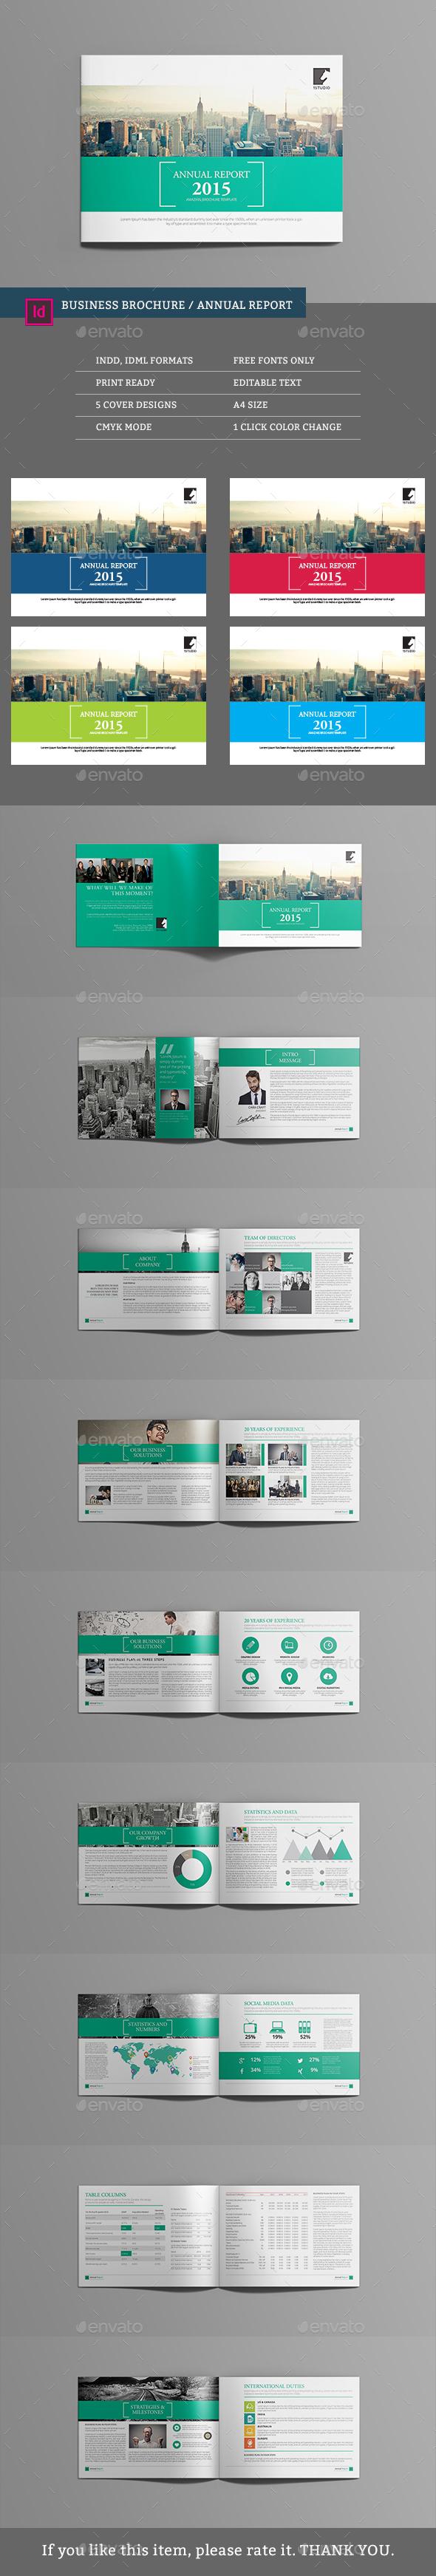 Multipurpose Brochure Template - Corporate Brochures